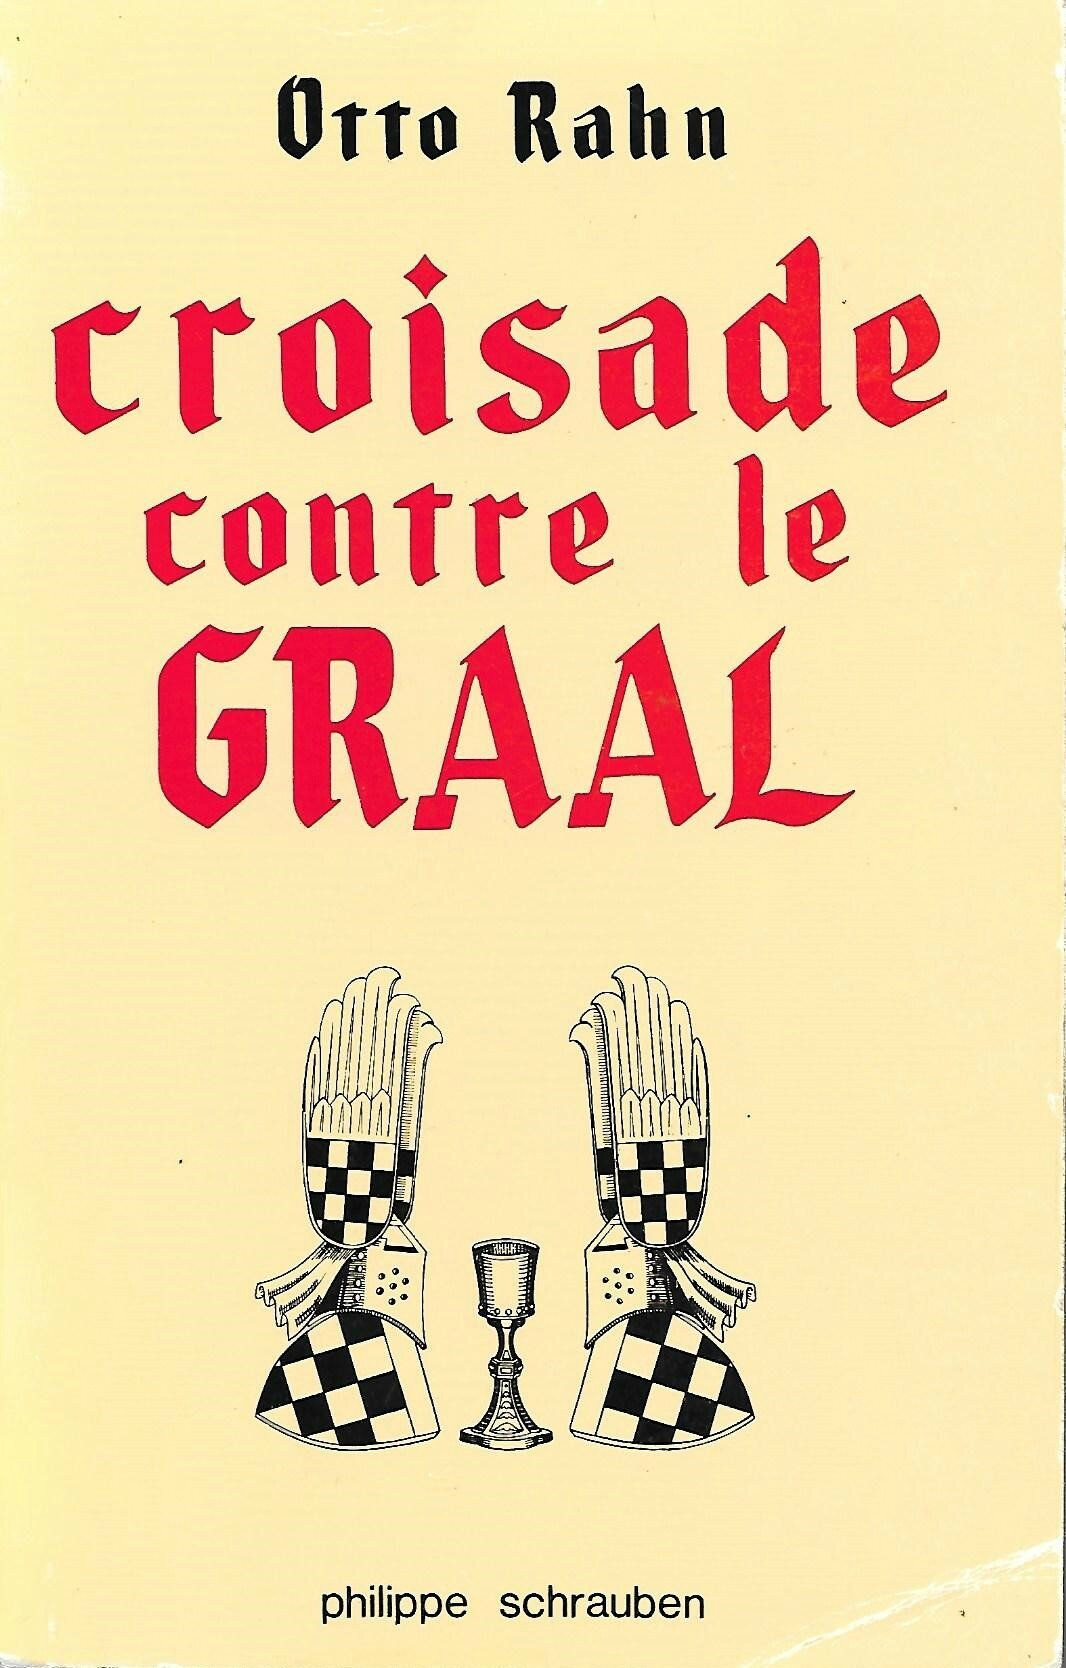 CROISADE CONTRE LE GRAAL - par Otto Rahn